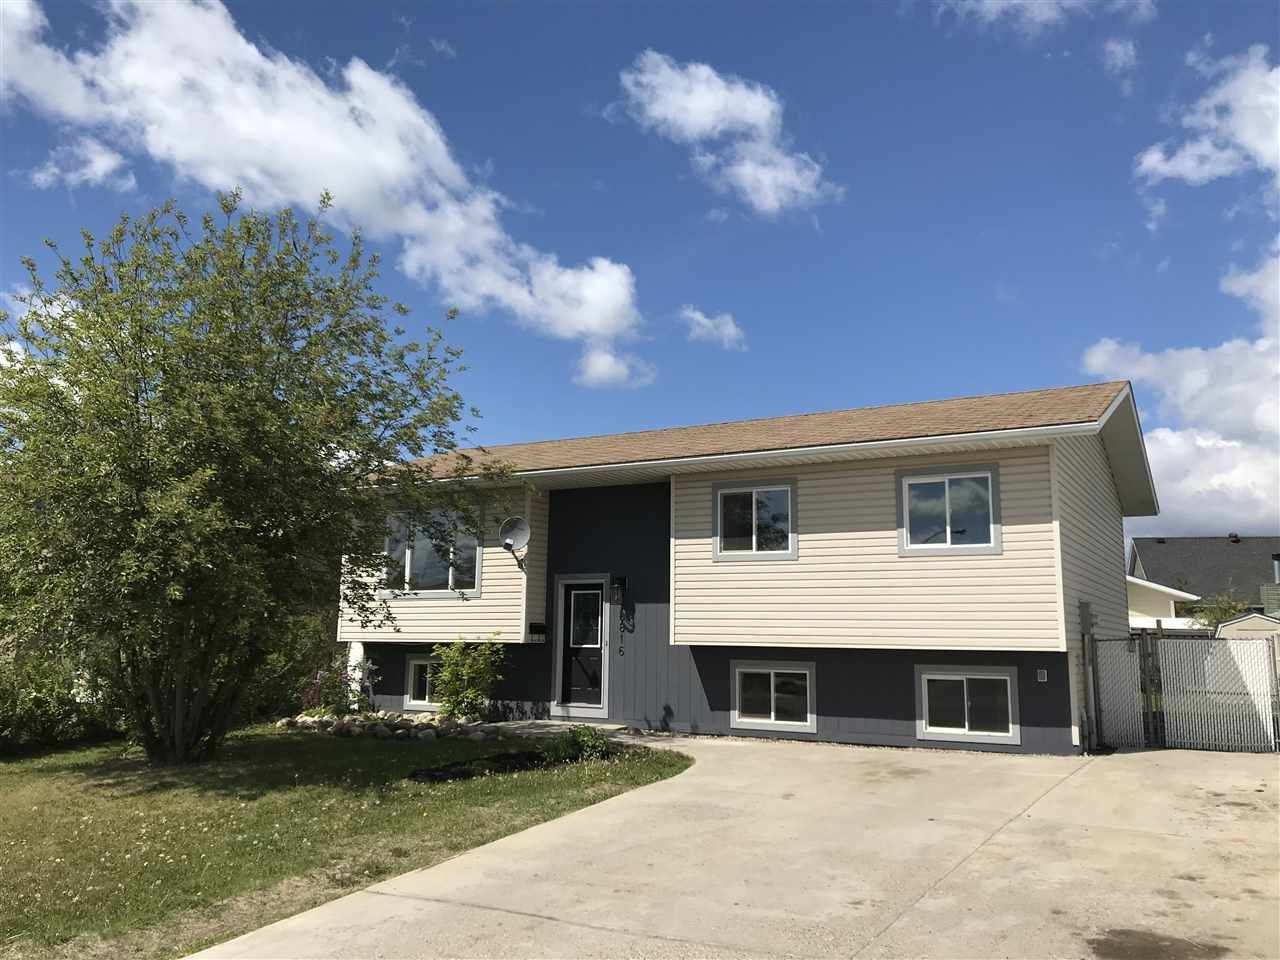 Main Photo: 8816 107A Avenue: Fort St. John - City NE House for sale (Fort St. John (Zone 60))  : MLS®# R2379749